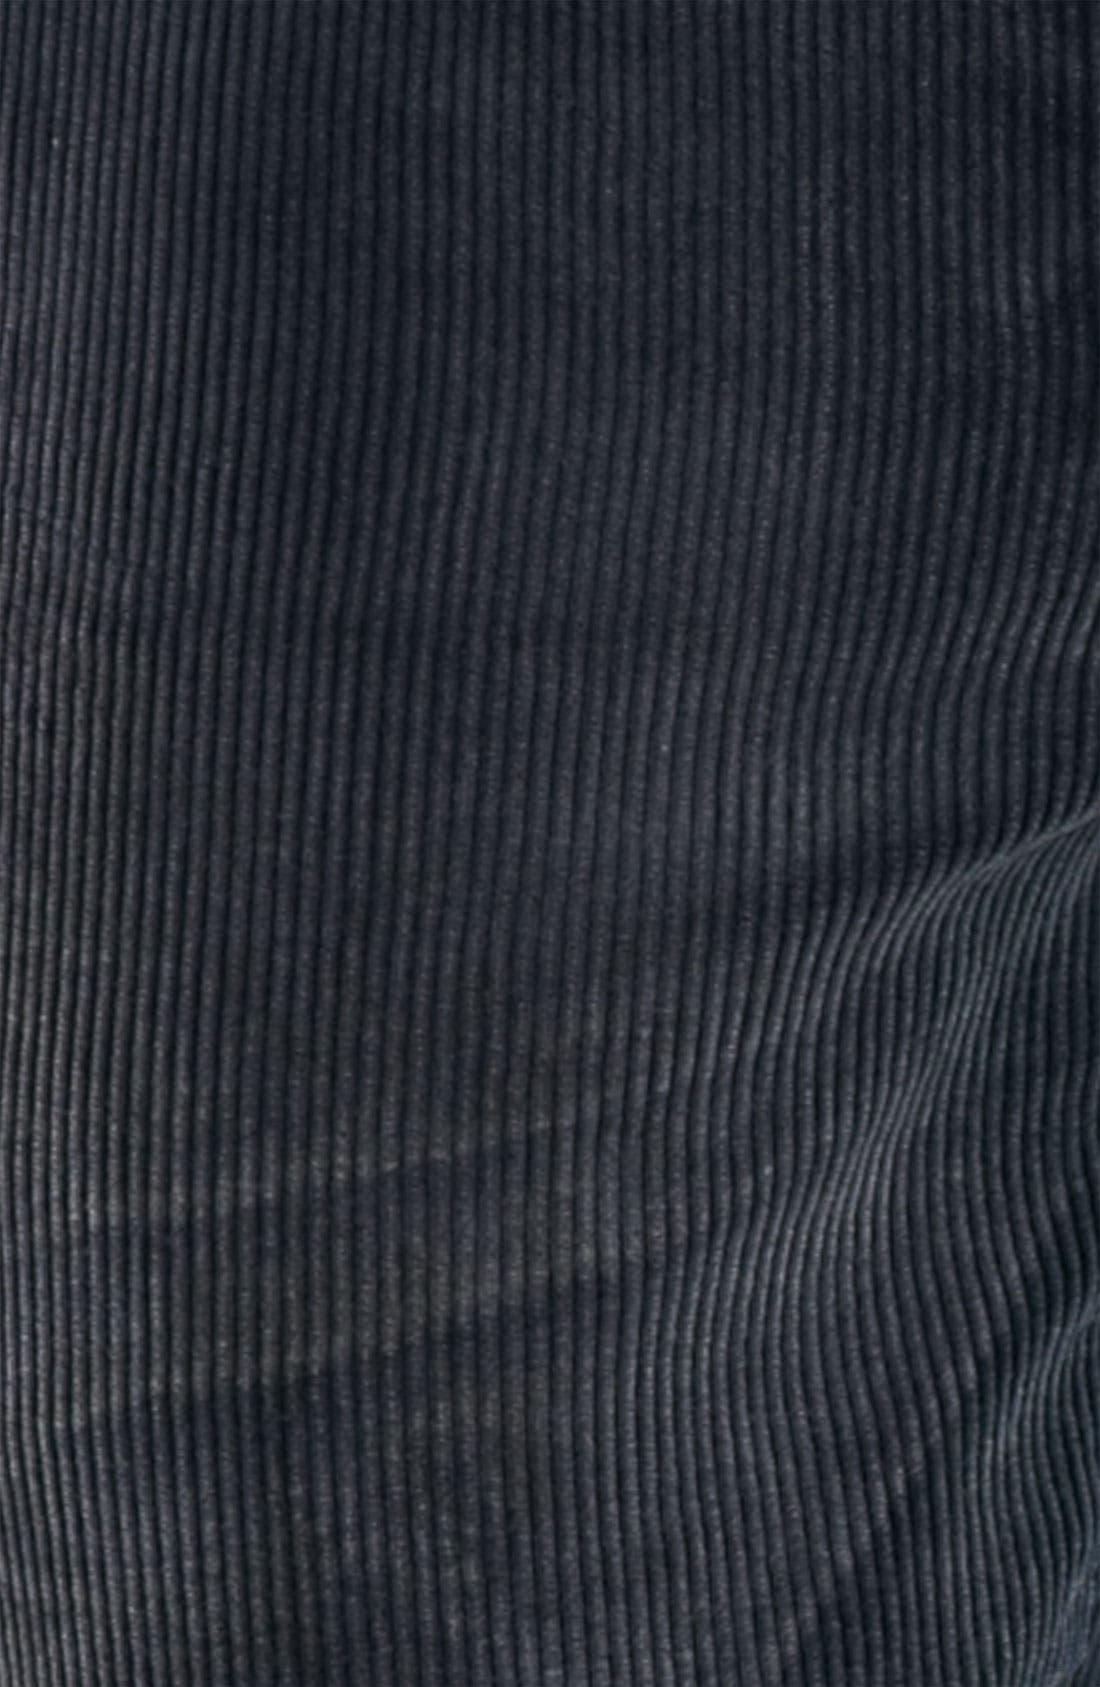 Alternate Image 3  - Polo Ralph Lauren 'Country' Corduroy Pants